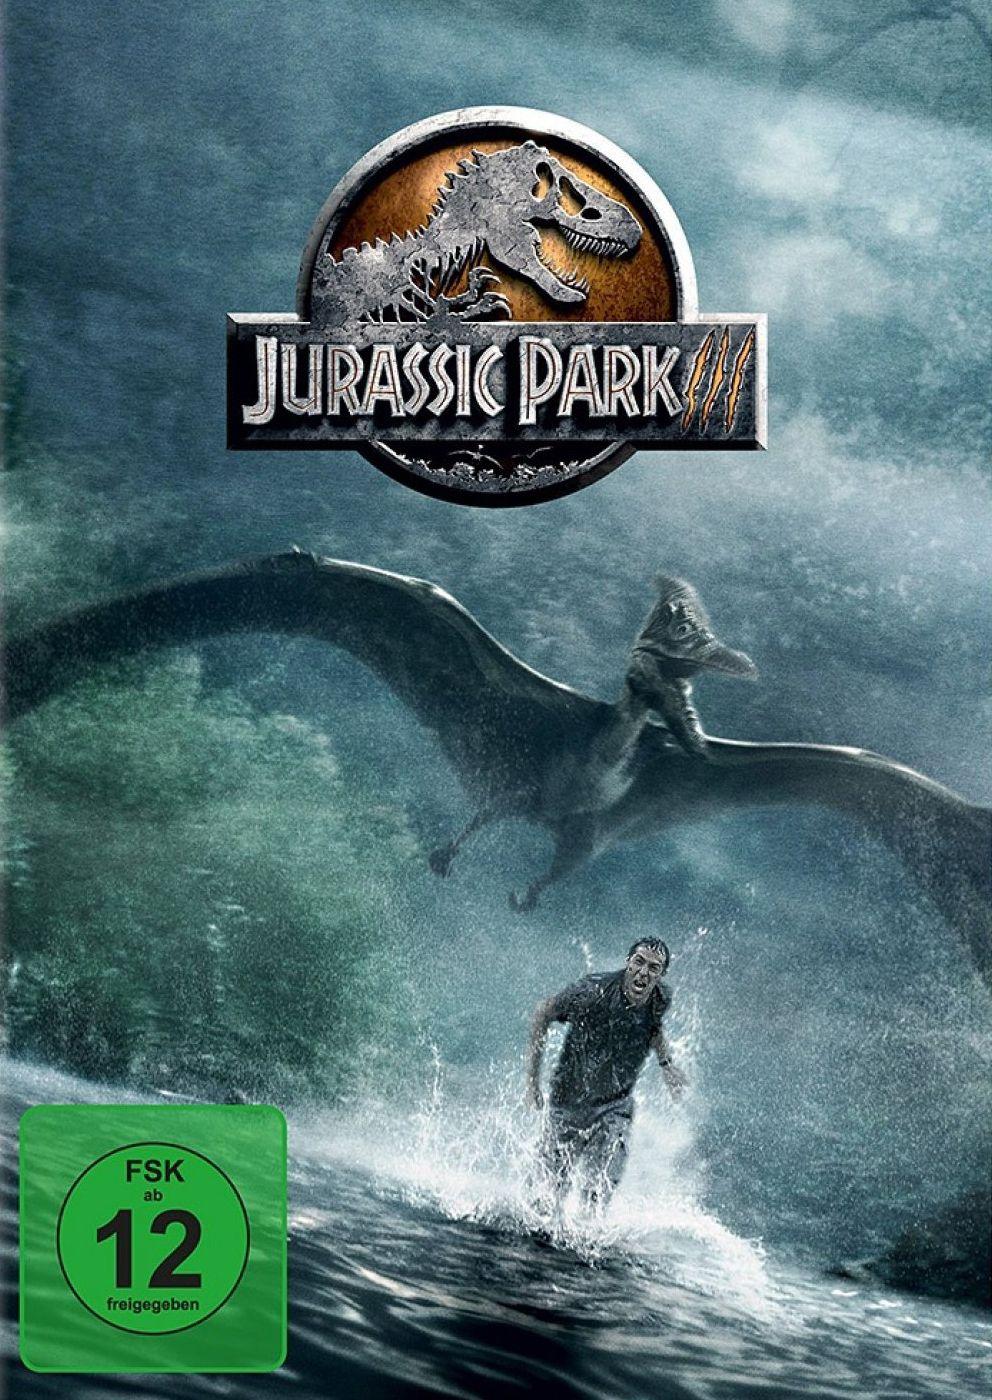 Jurassic Park 3 (Neuauflage)